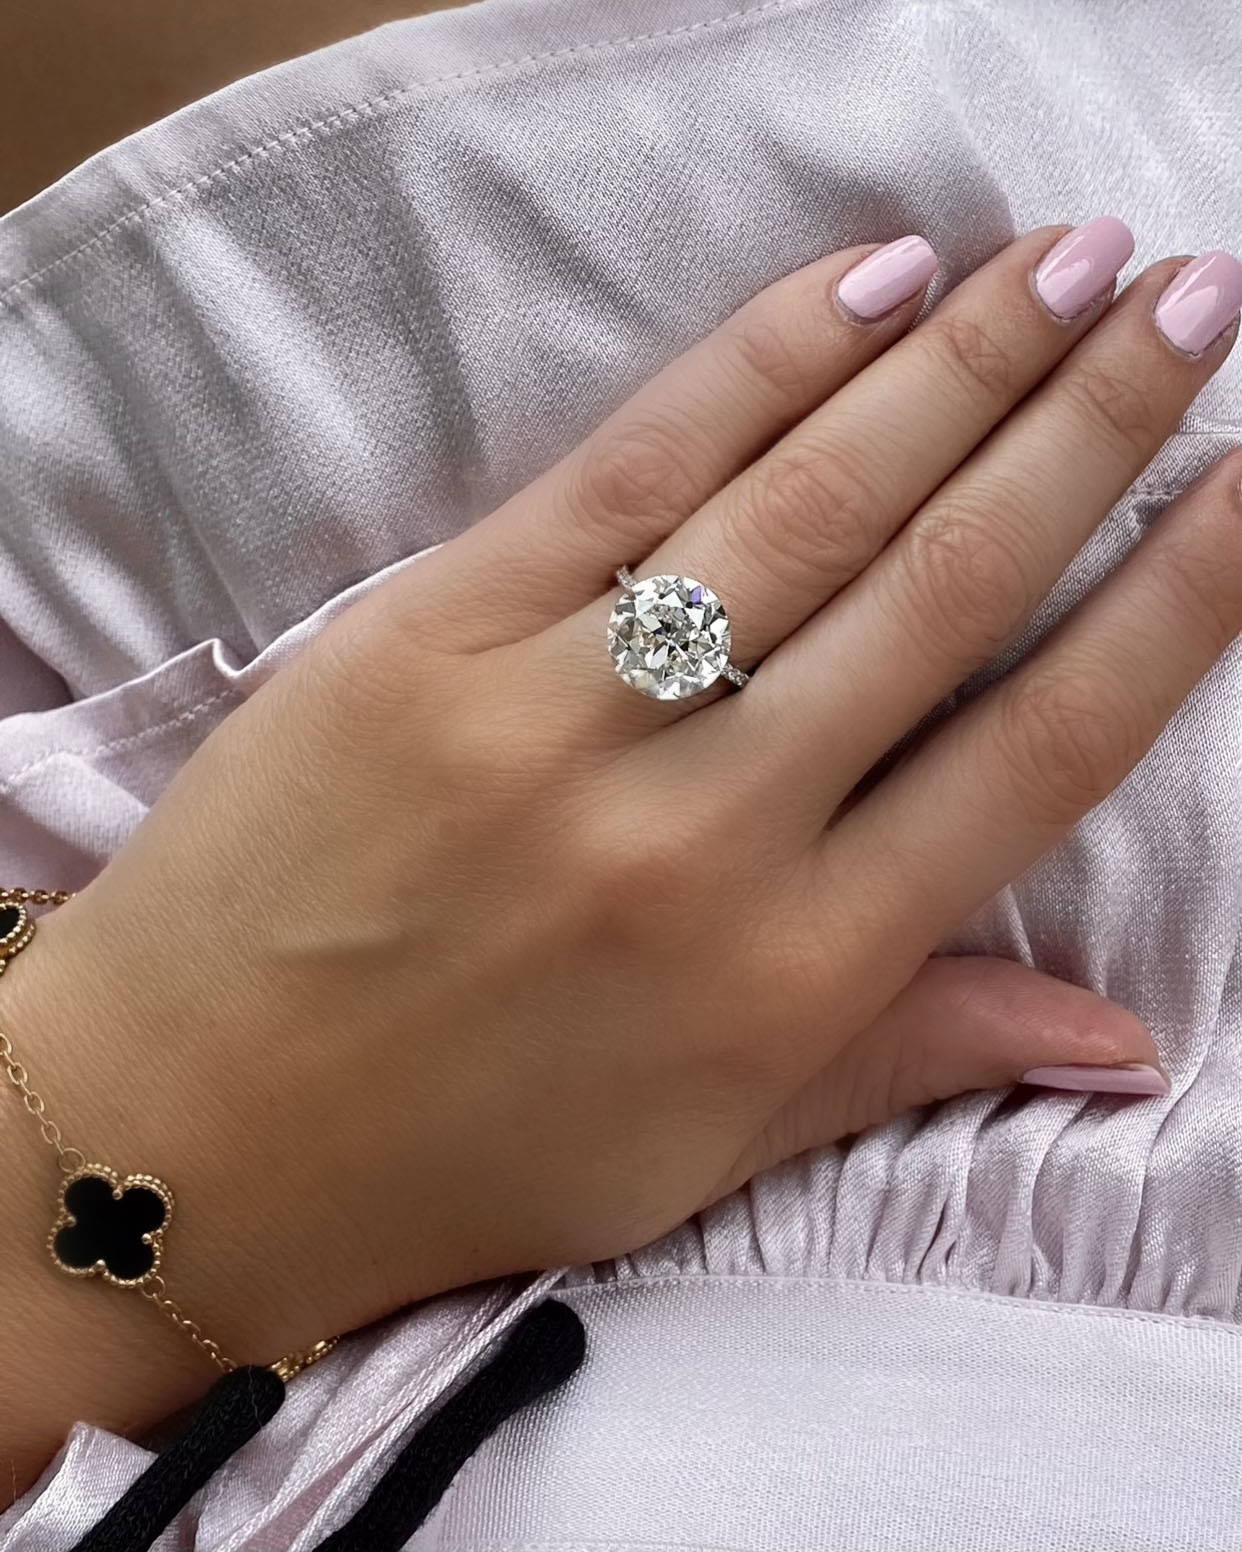 Miss Diamond Ring 5 Carat 6 Carat Round Diamond Engagement Ring